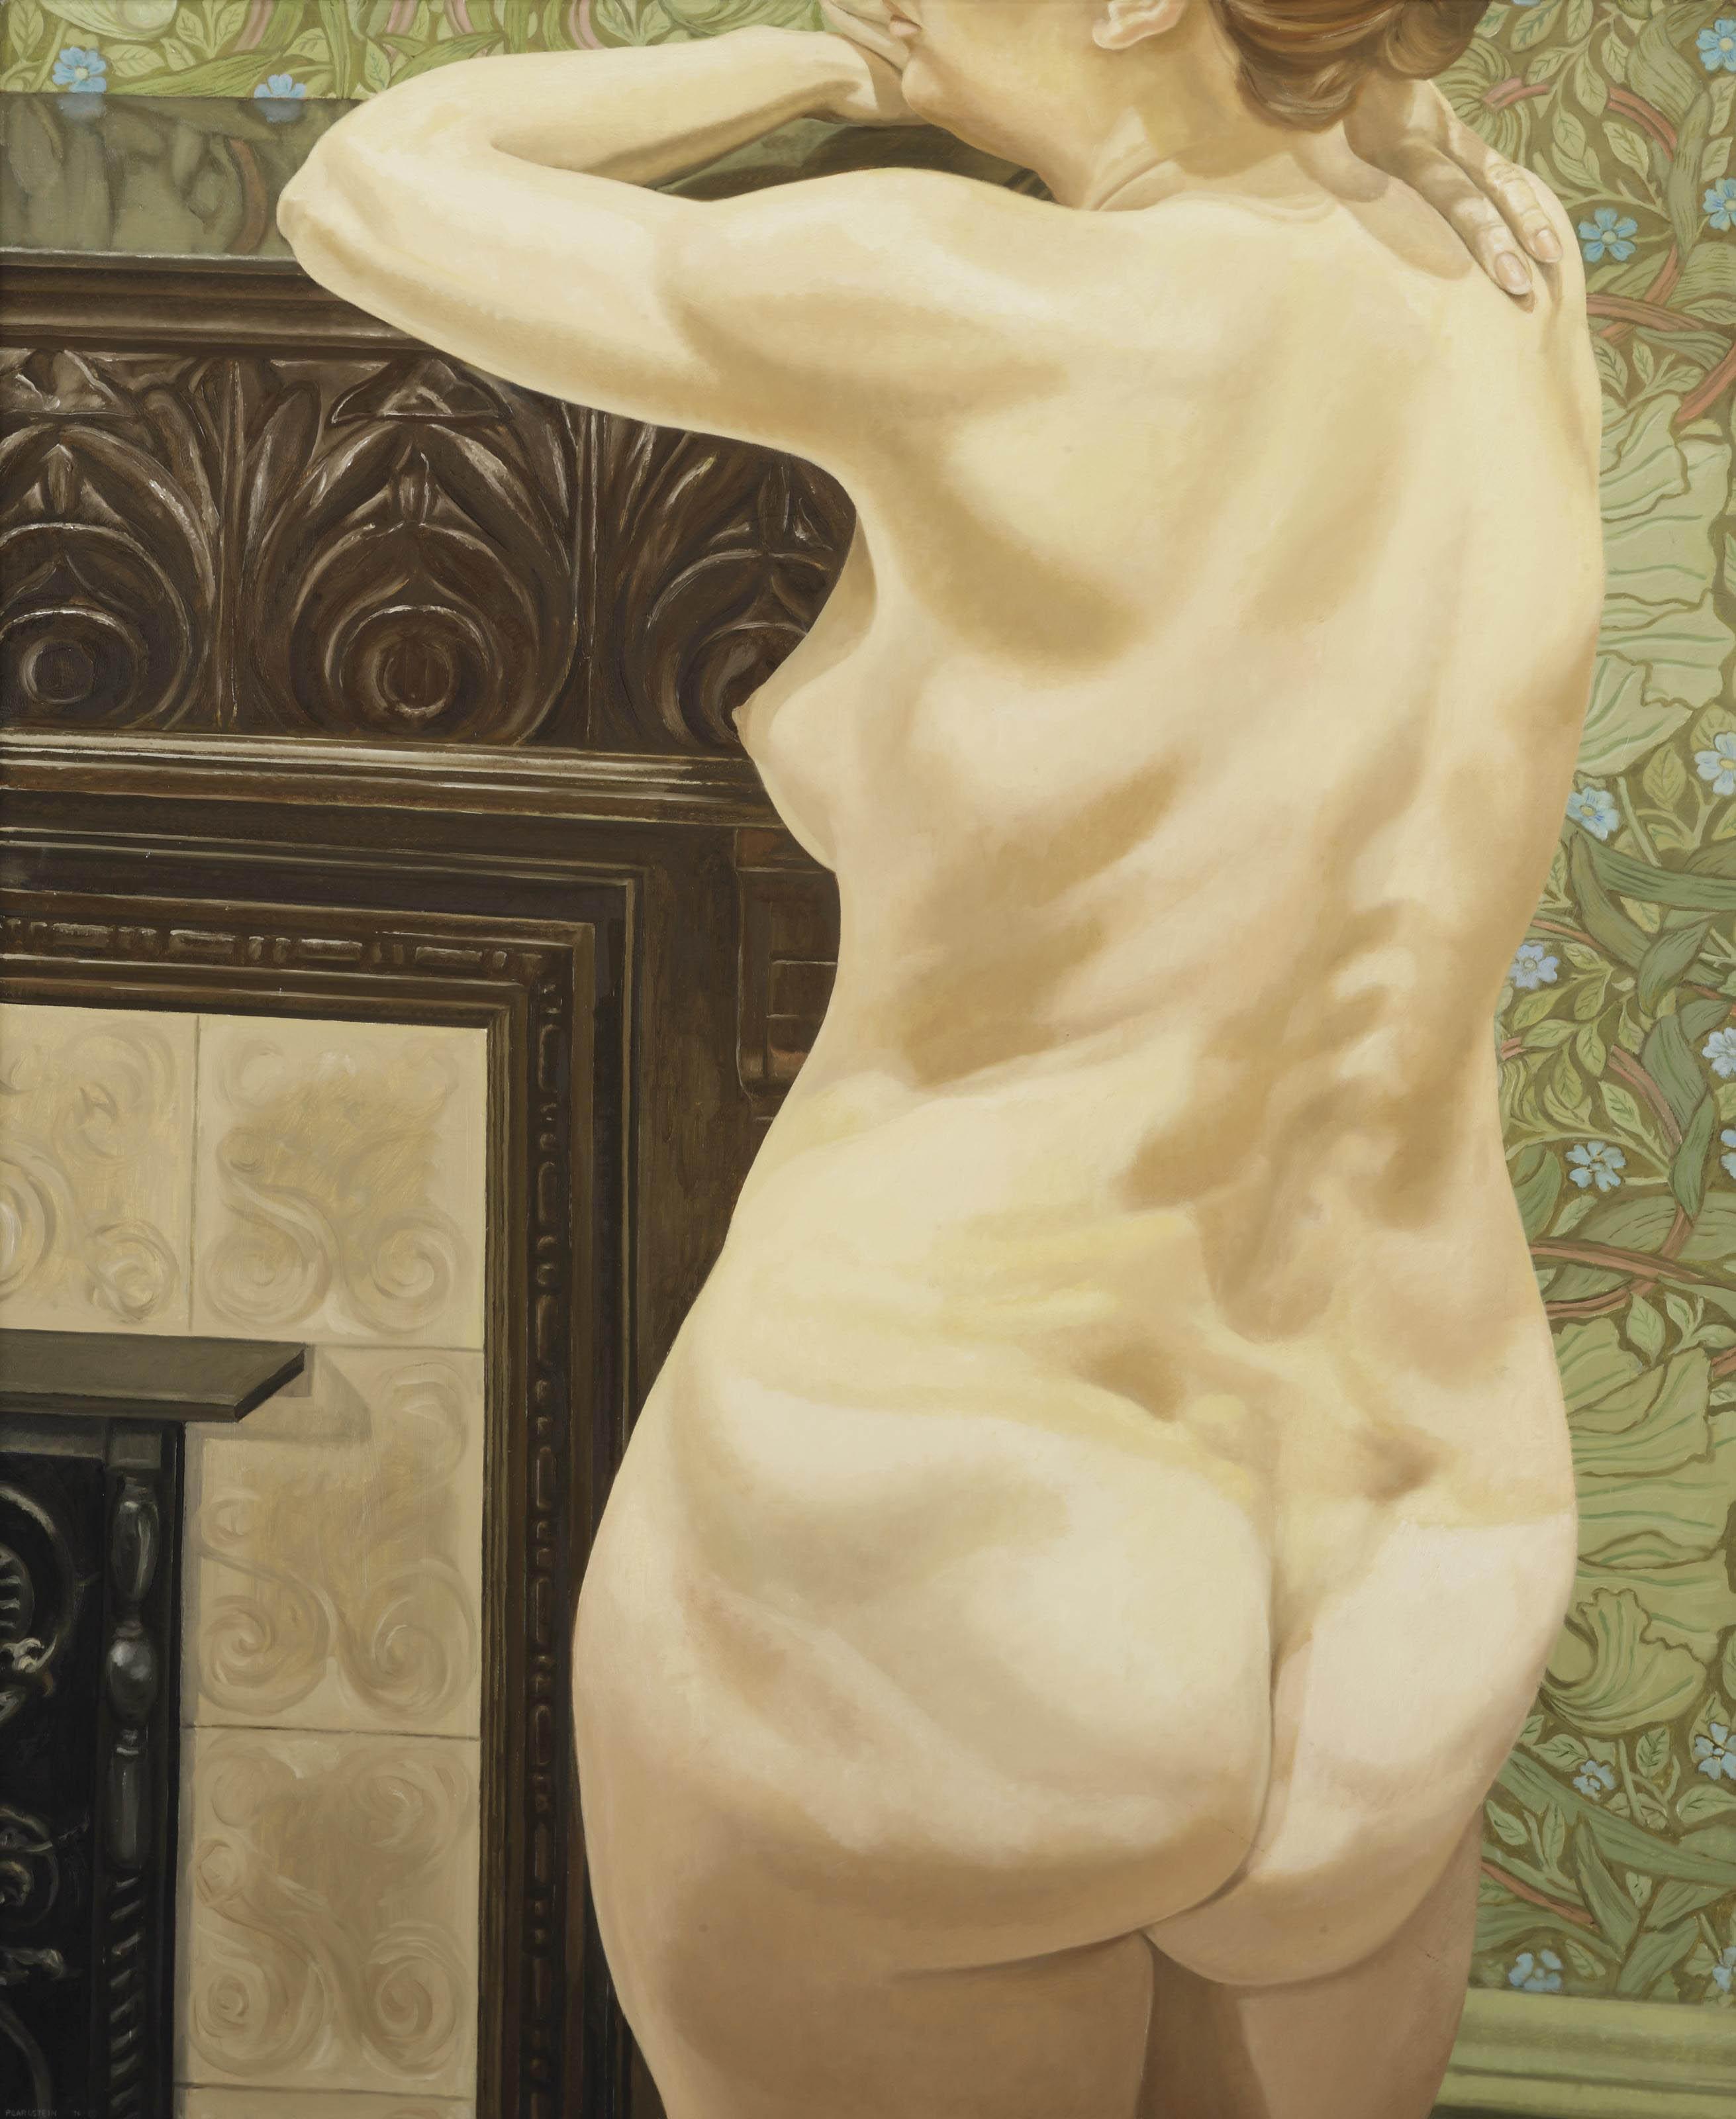 Female model leaning on mantel